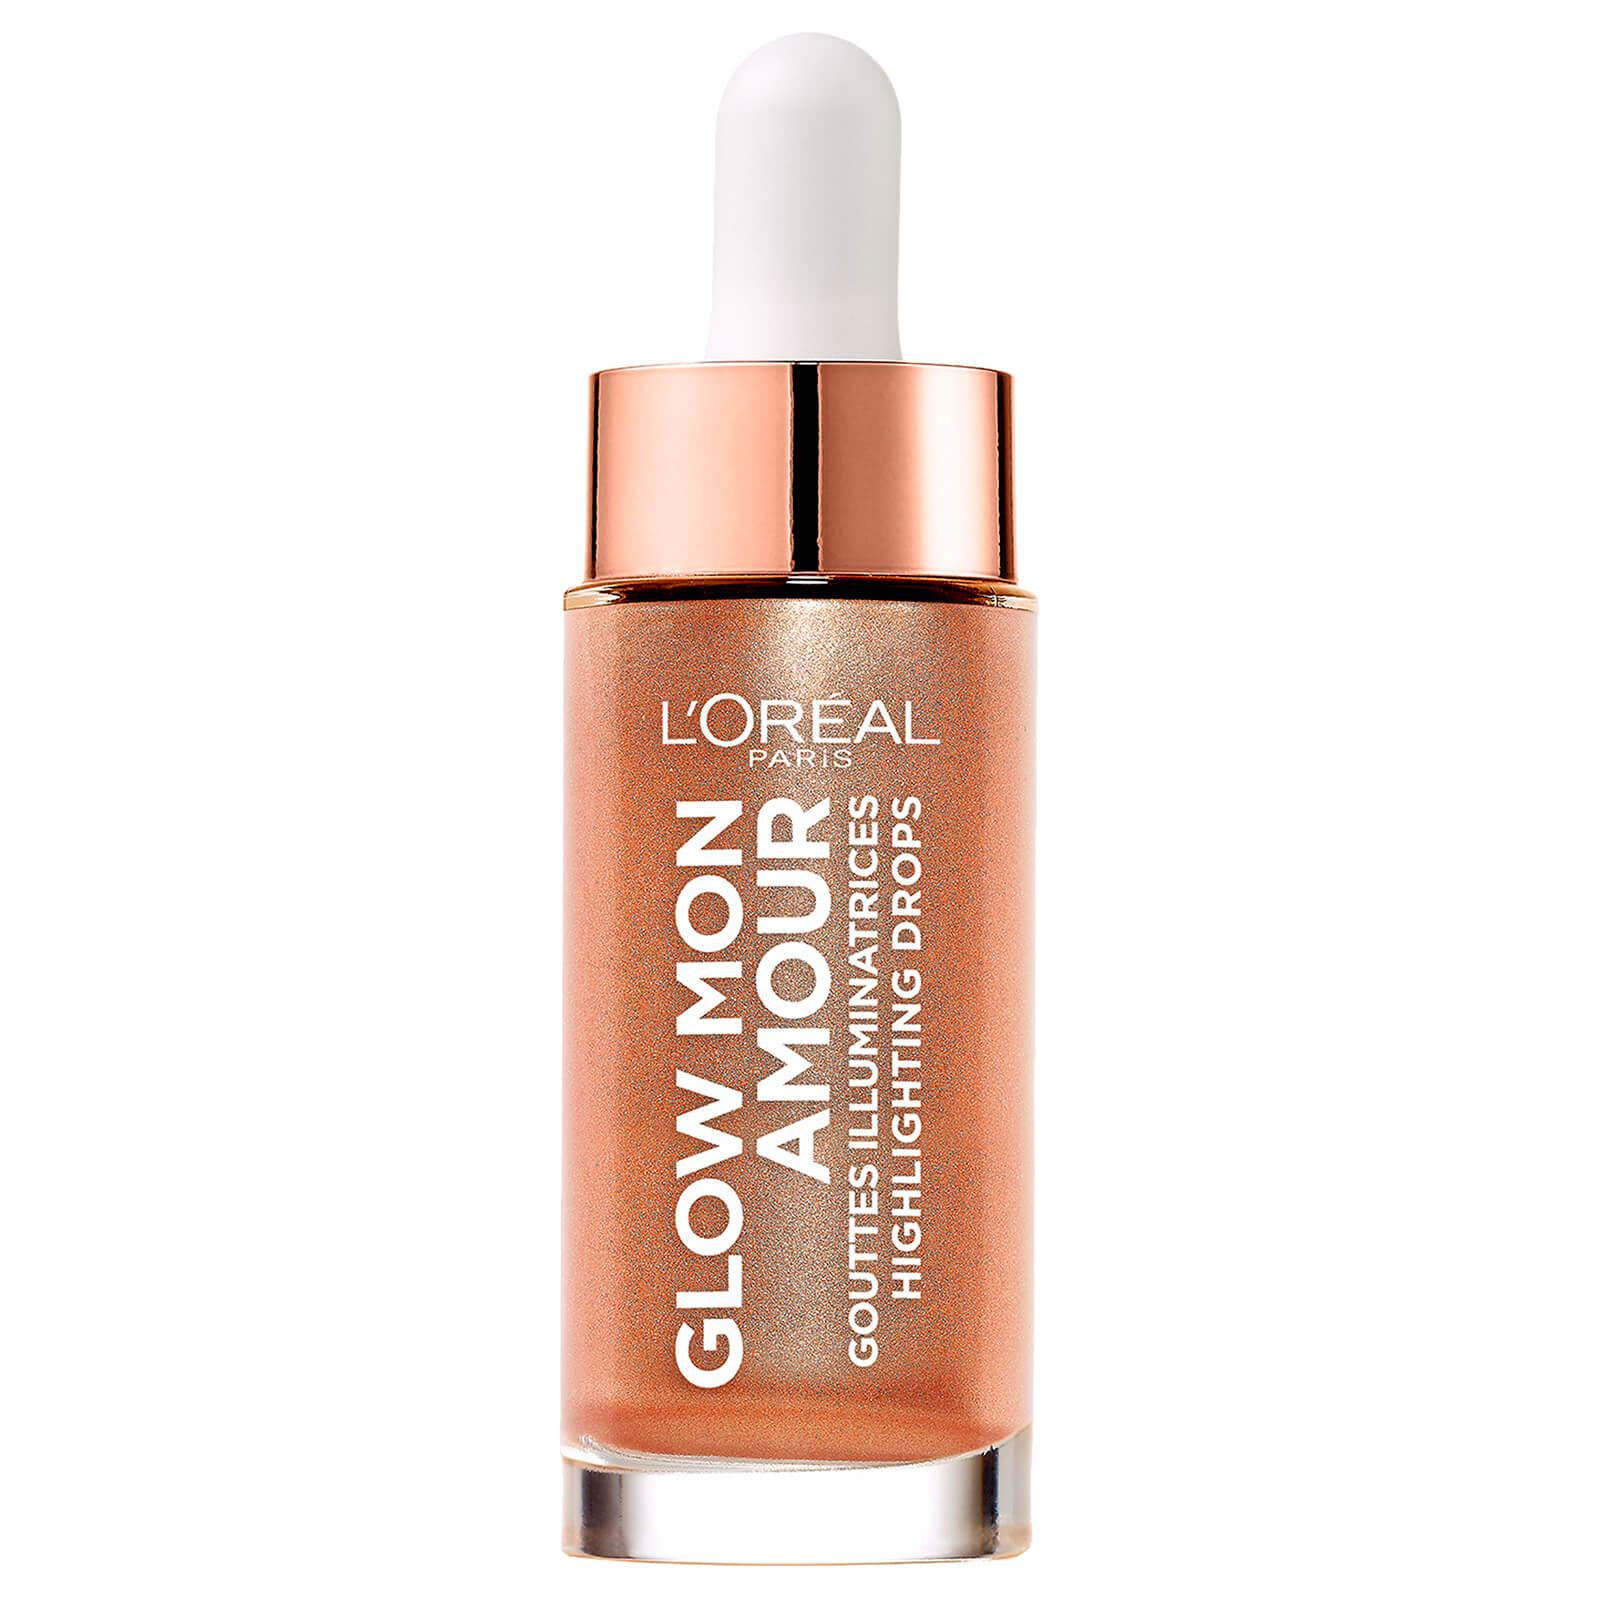 Купить L'Oréal Paris Glow Mon Amour Liquid Highlighting Drops - Bellini 15ml